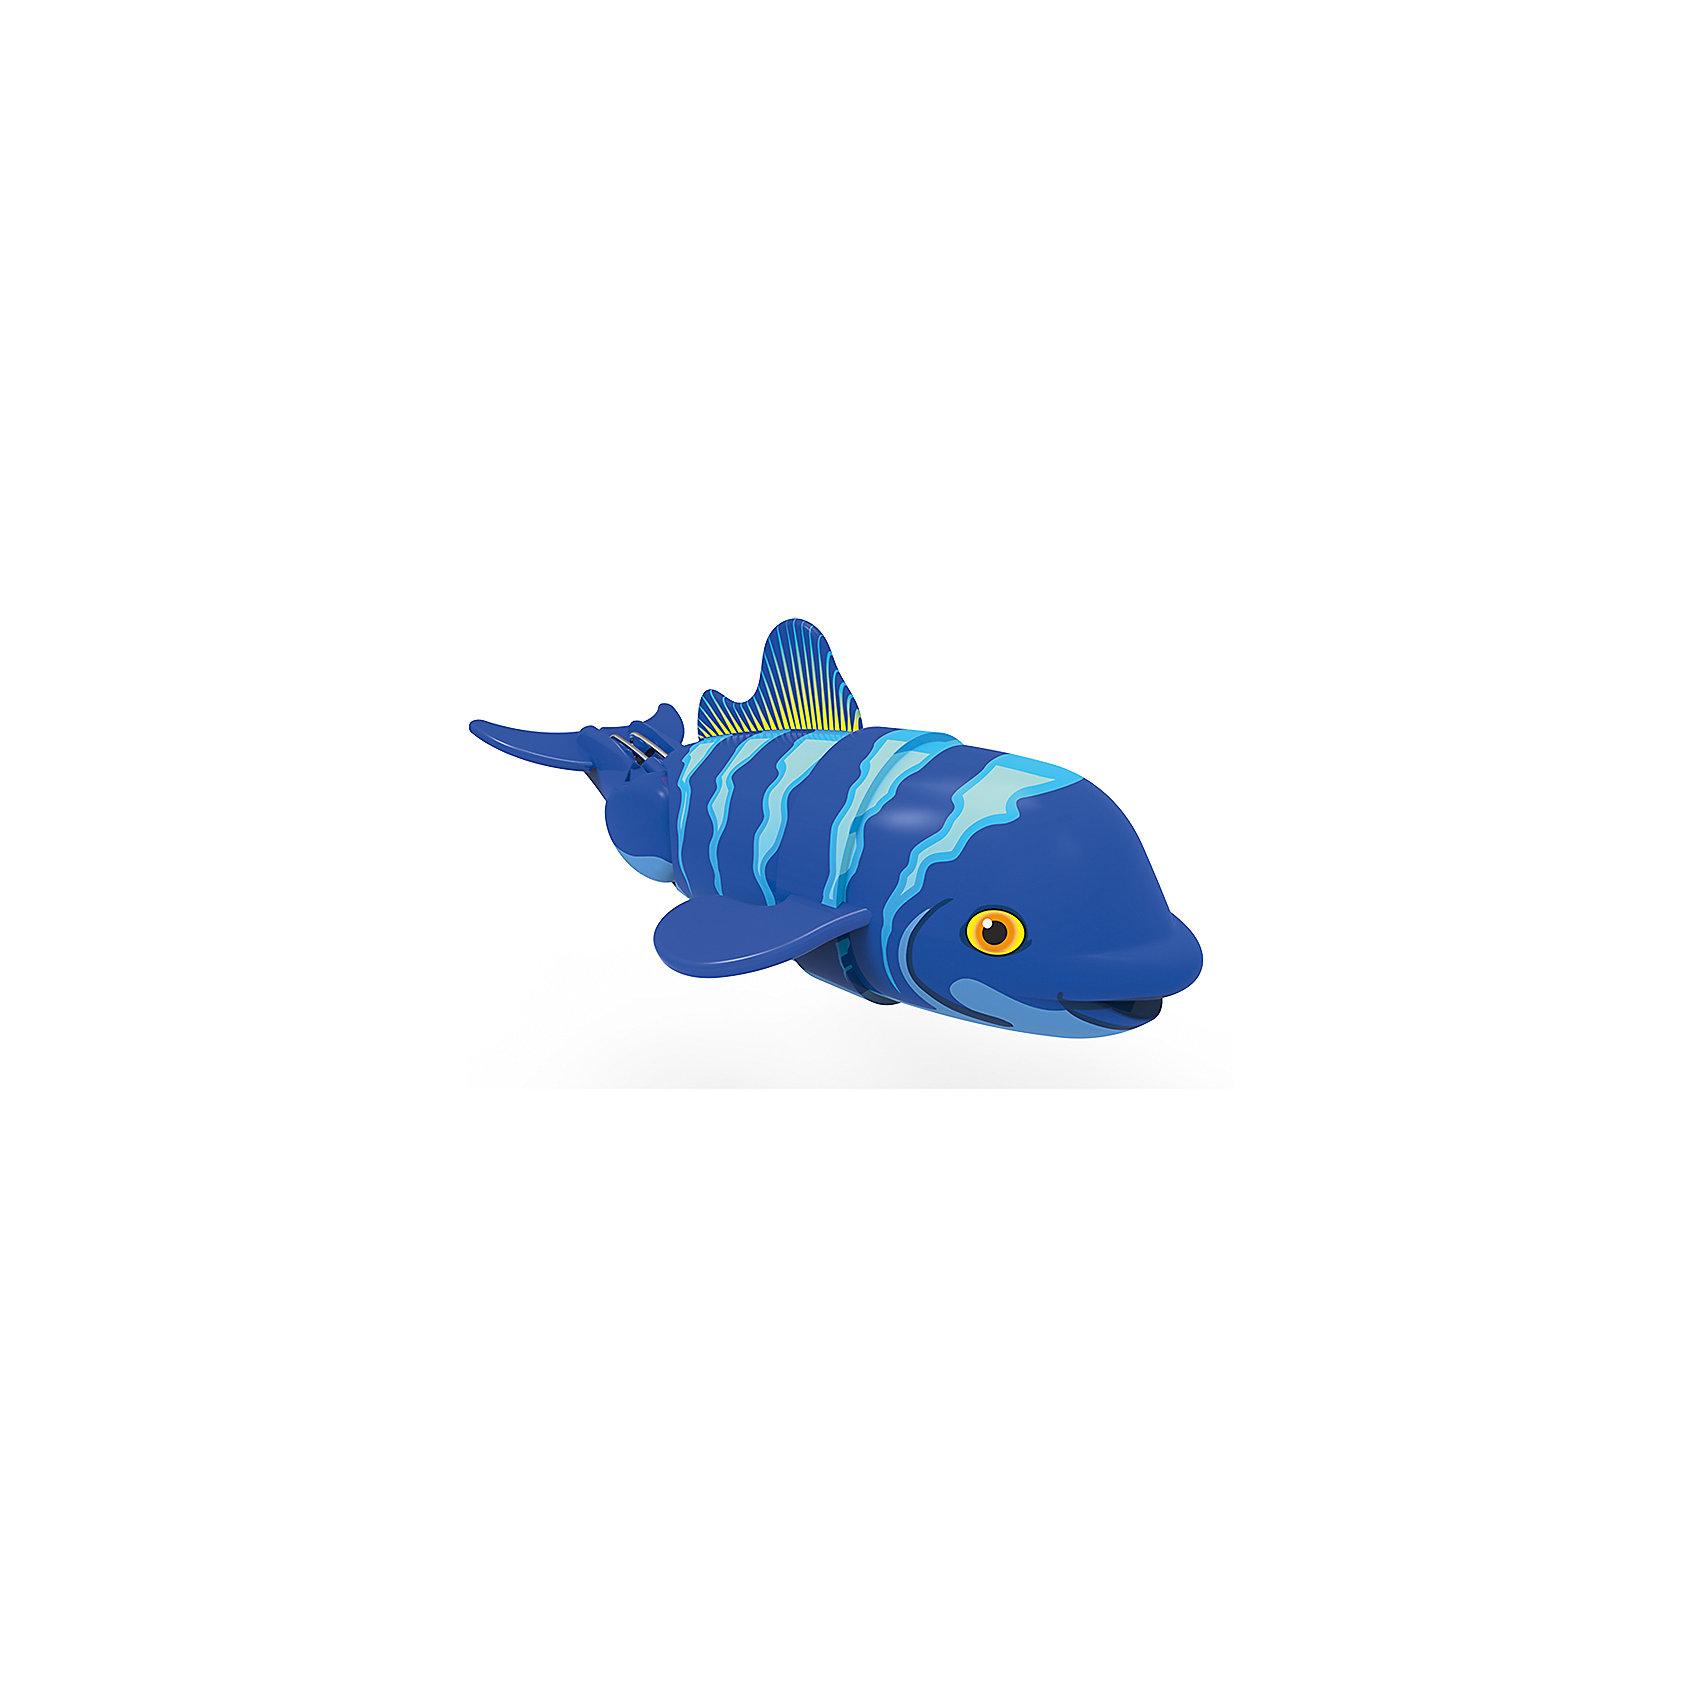 Рыбка-акробат Санни, 12 см, REDWOODРыбка-акробат плавает и ныряет. Траектория движения игрушки зависит от наклона хвоста. Игрушка работает от двух батарее типа ААА (LR03). Батарейки в комплект не входят.<br><br>Ширина мм: 160<br>Глубина мм: 140<br>Высота мм: 85<br>Вес г: 416<br>Возраст от месяцев: 36<br>Возраст до месяцев: 2147483647<br>Пол: Унисекс<br>Возраст: Детский<br>SKU: 5544171